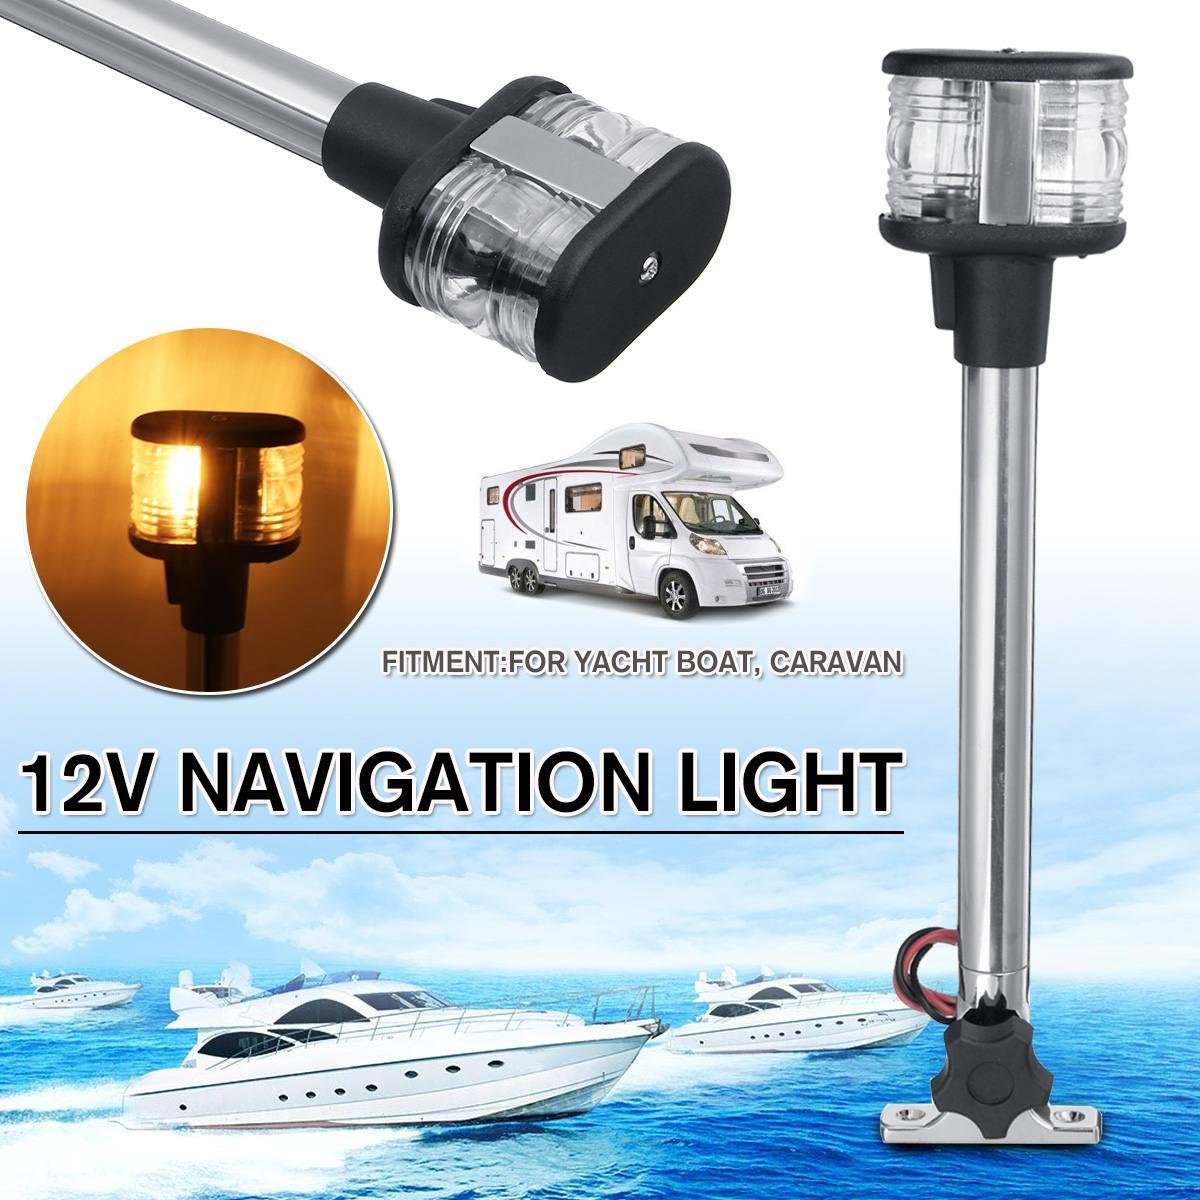 NEW DC12V 37.5cm Fold Down Marine Boat LED Navigation Lights Marine Boat Yacht Stern Anchor Light LED Sailing Light Lamp(China)